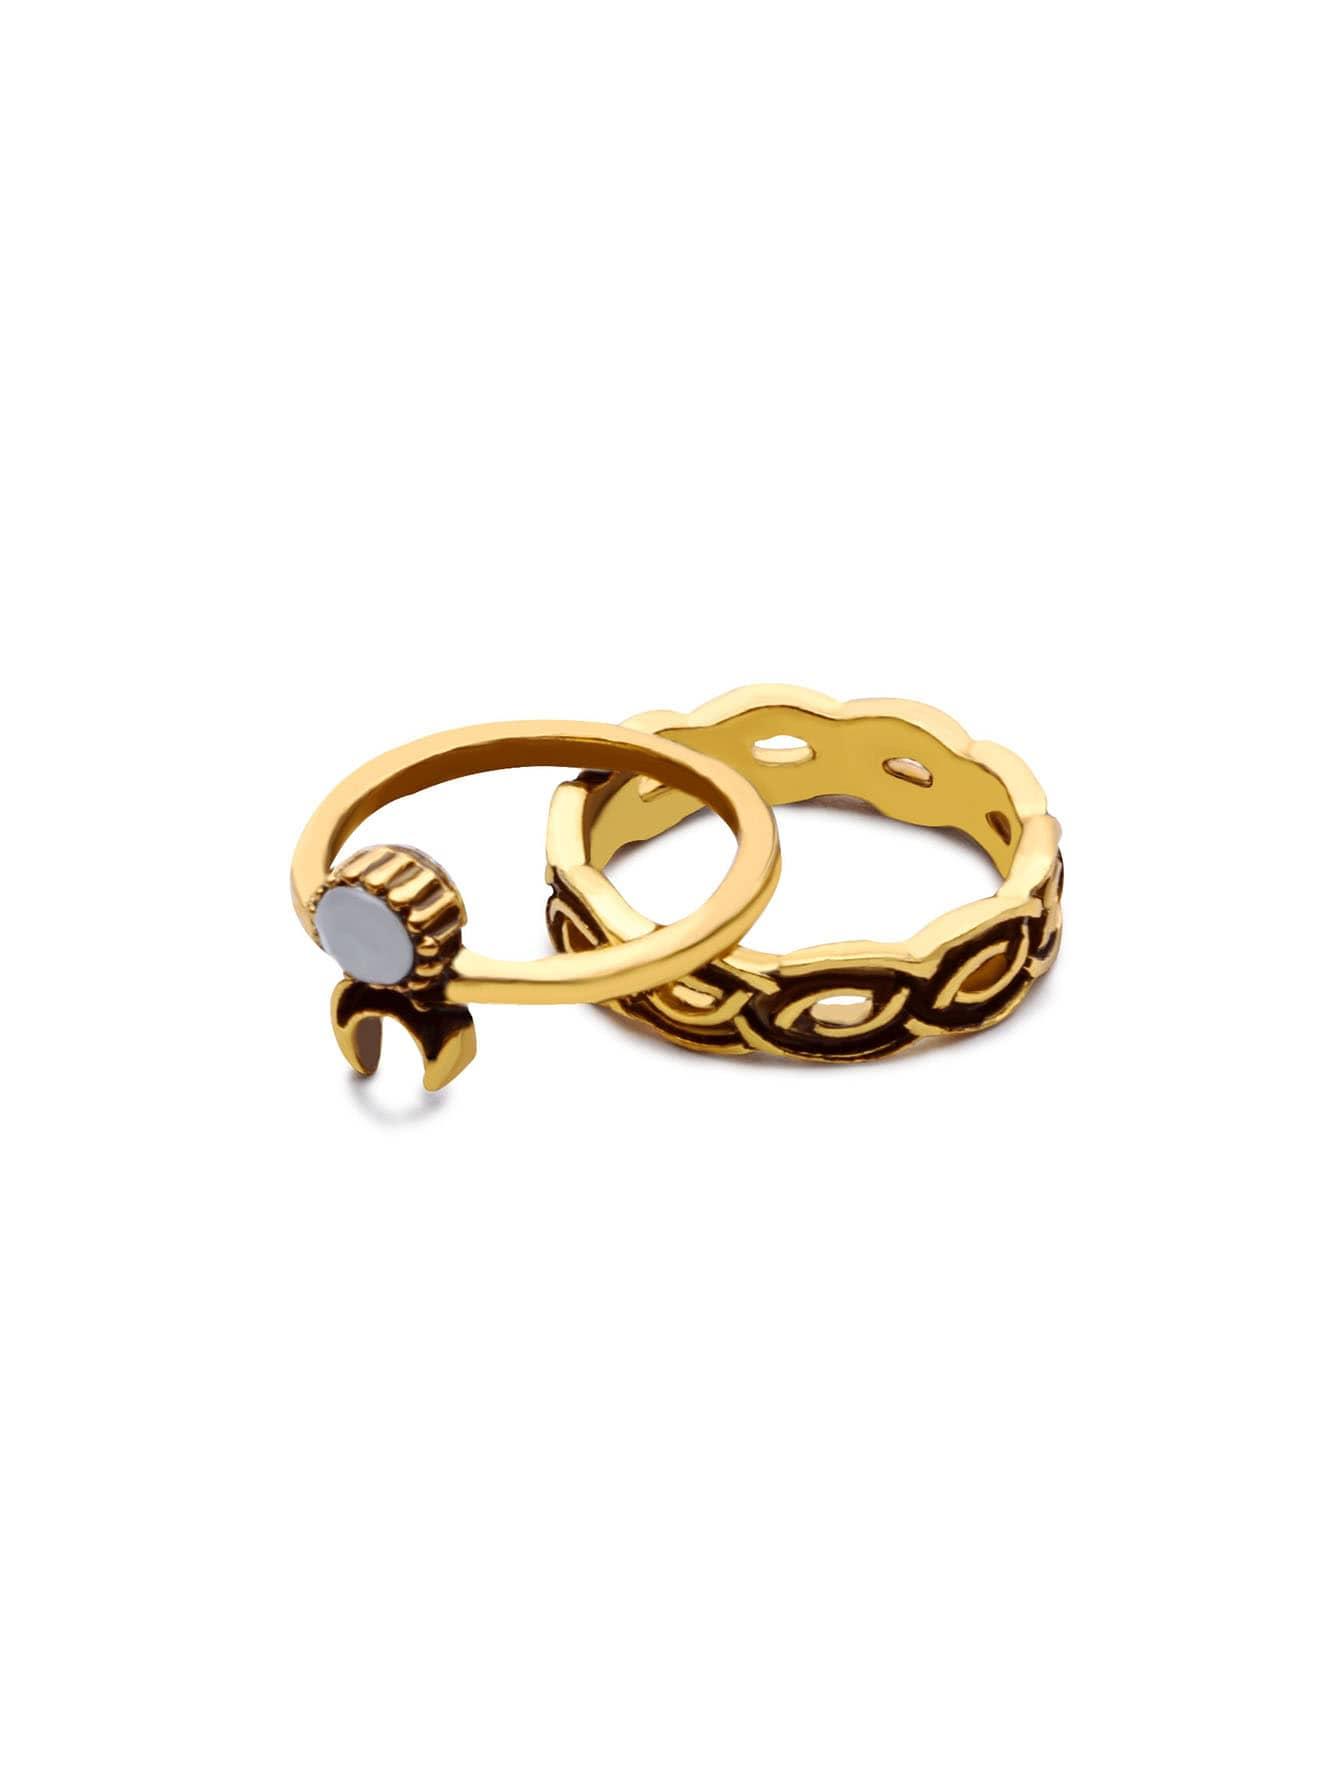 10PCS Antique Gold Geometric Carved Ring Set